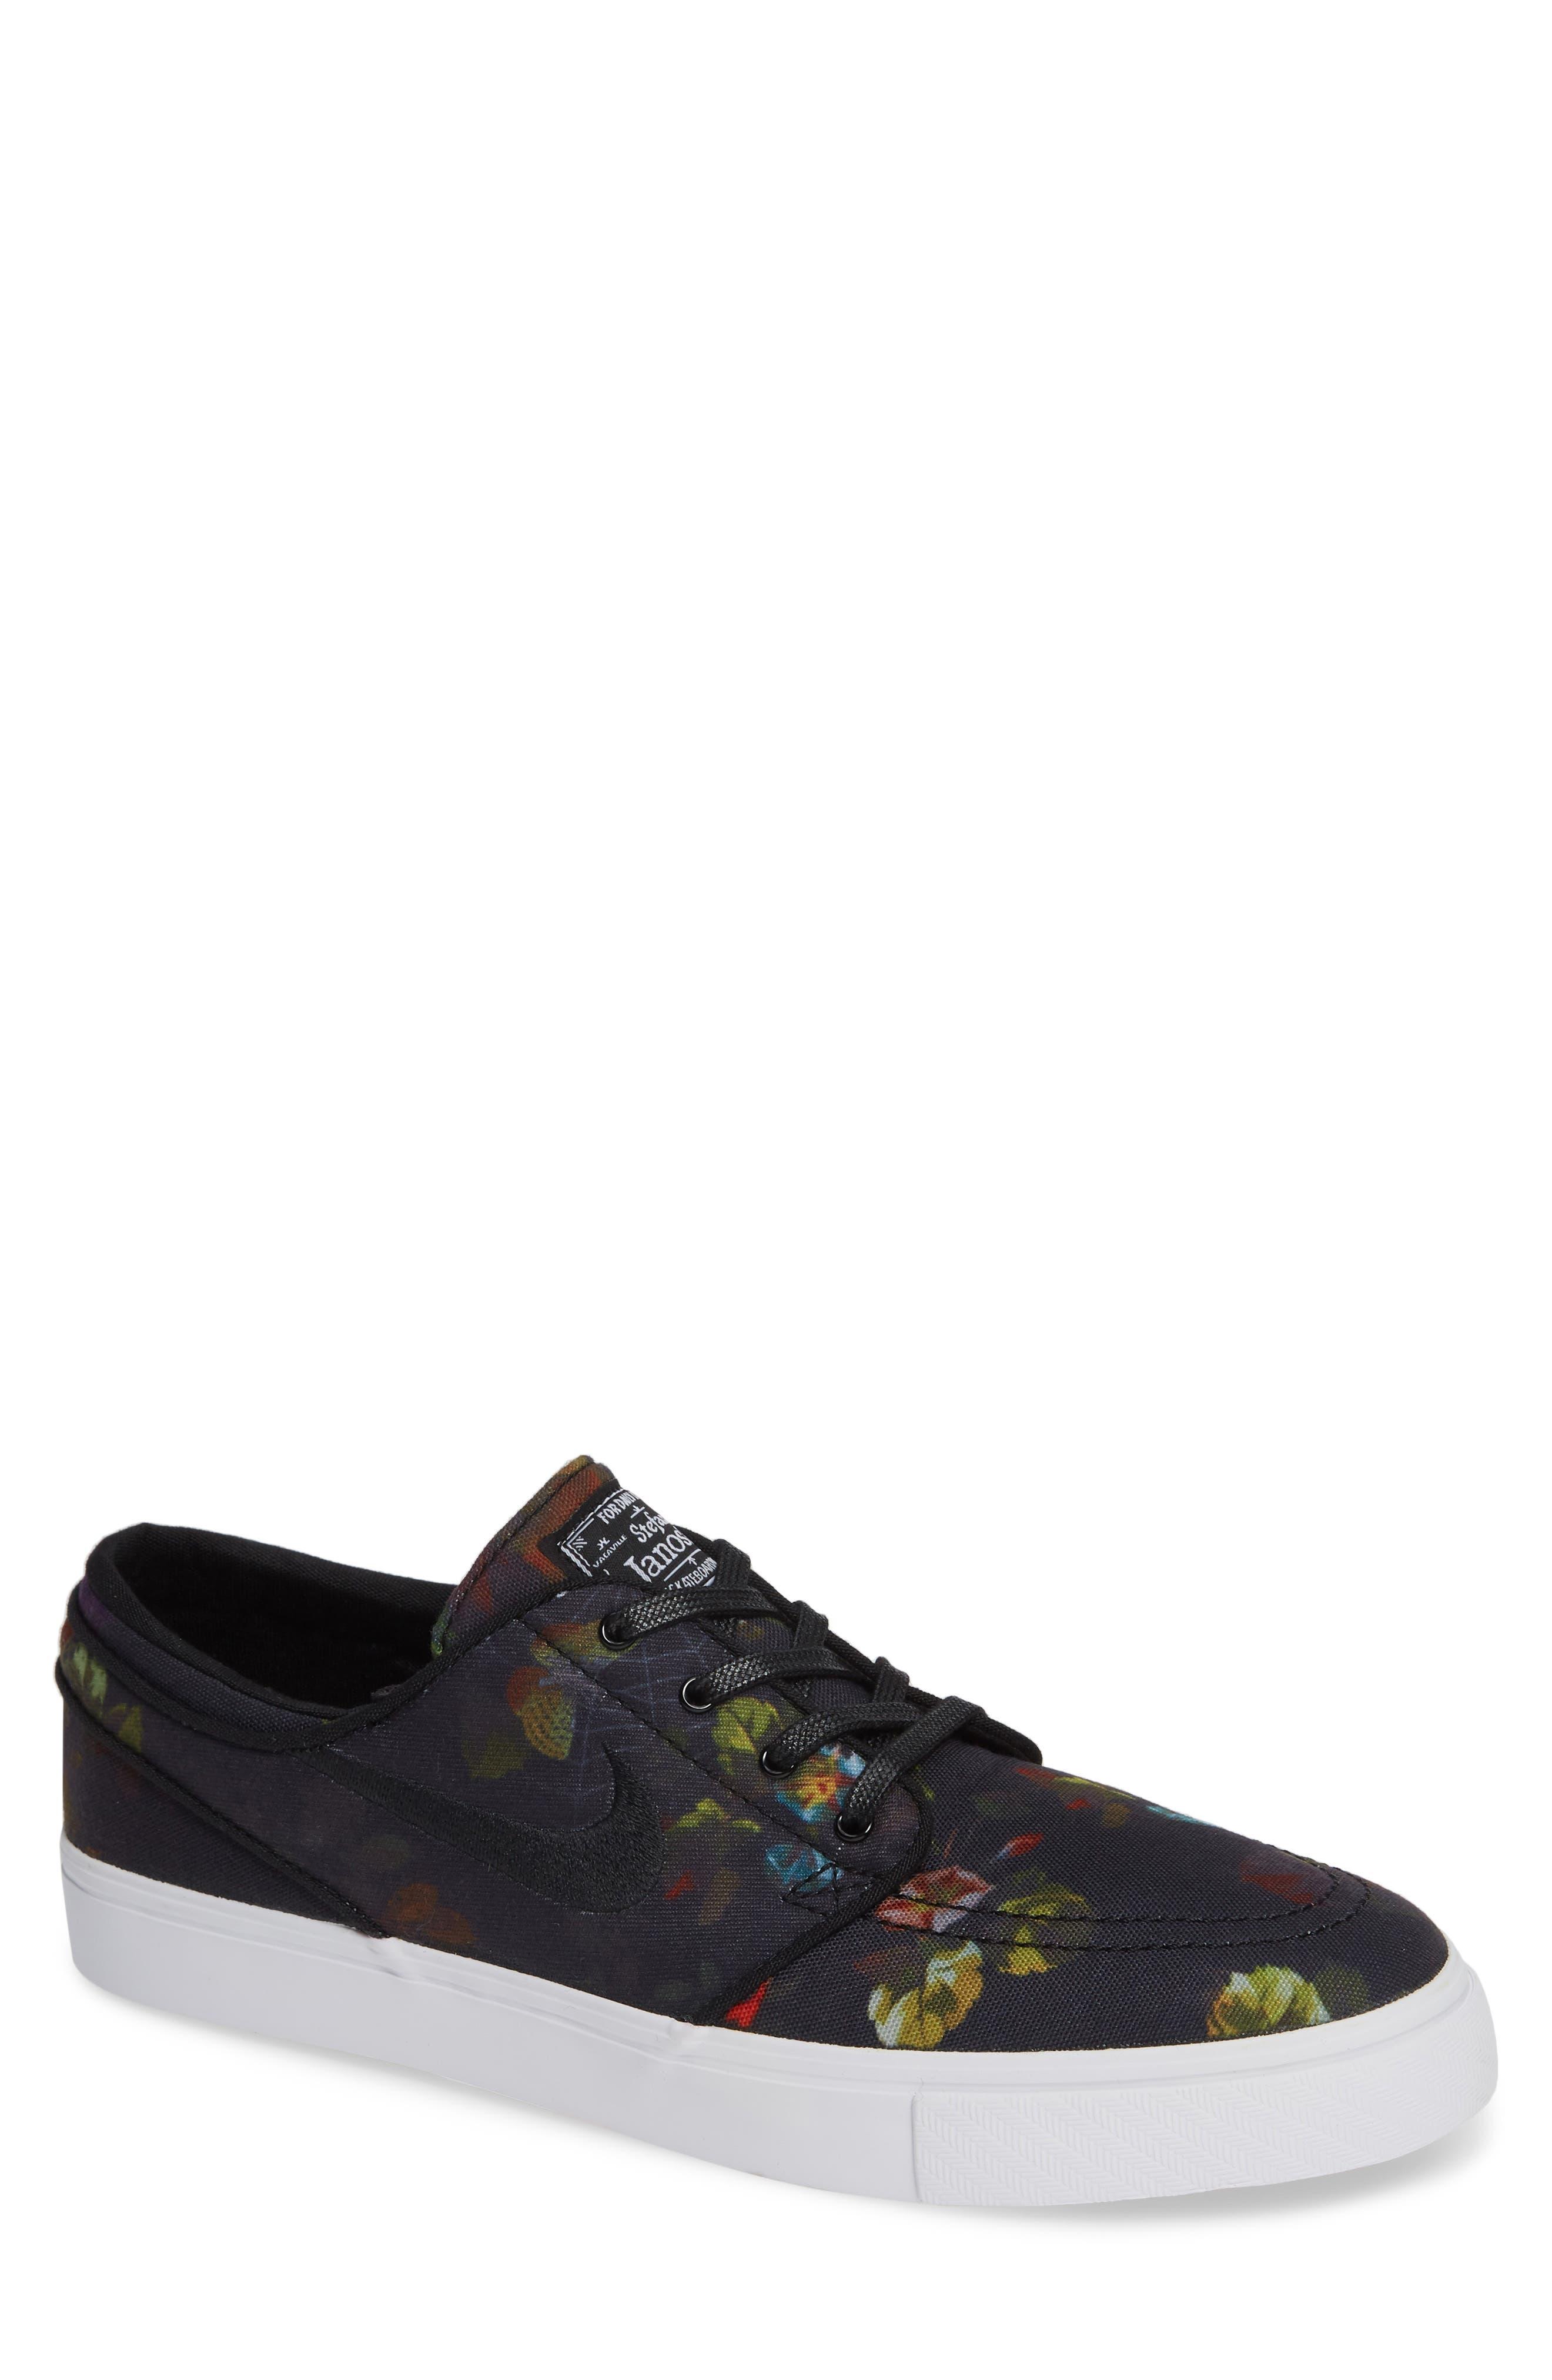 Zoom - Stefan Janoski SB Canvas Skate Shoe,                         Main,                         color,